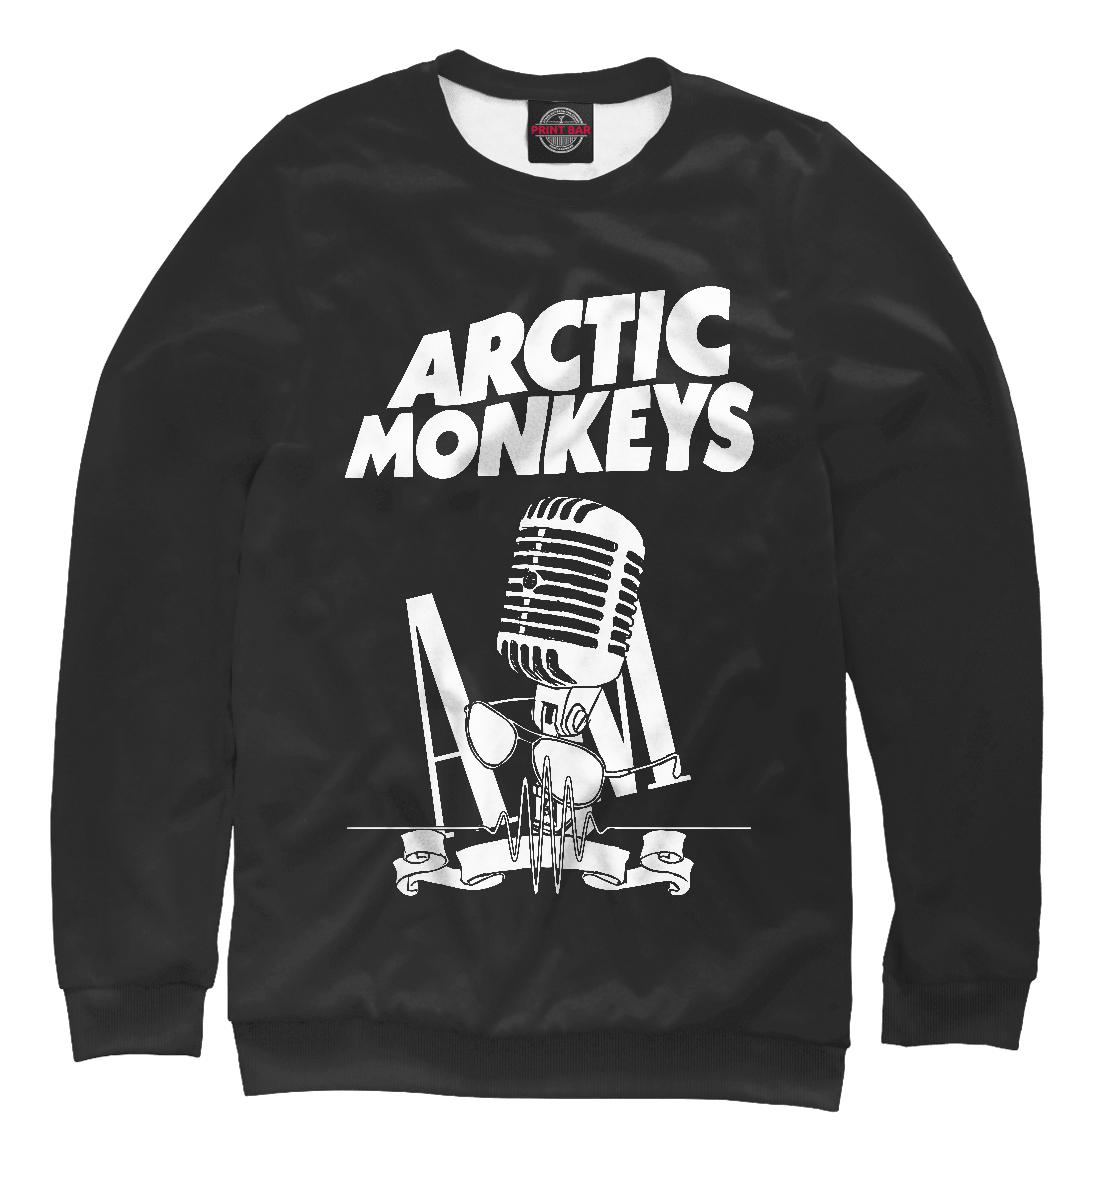 Купить Arctic Monkeys, Printbar, Свитшоты, AMK-917653-swi-2